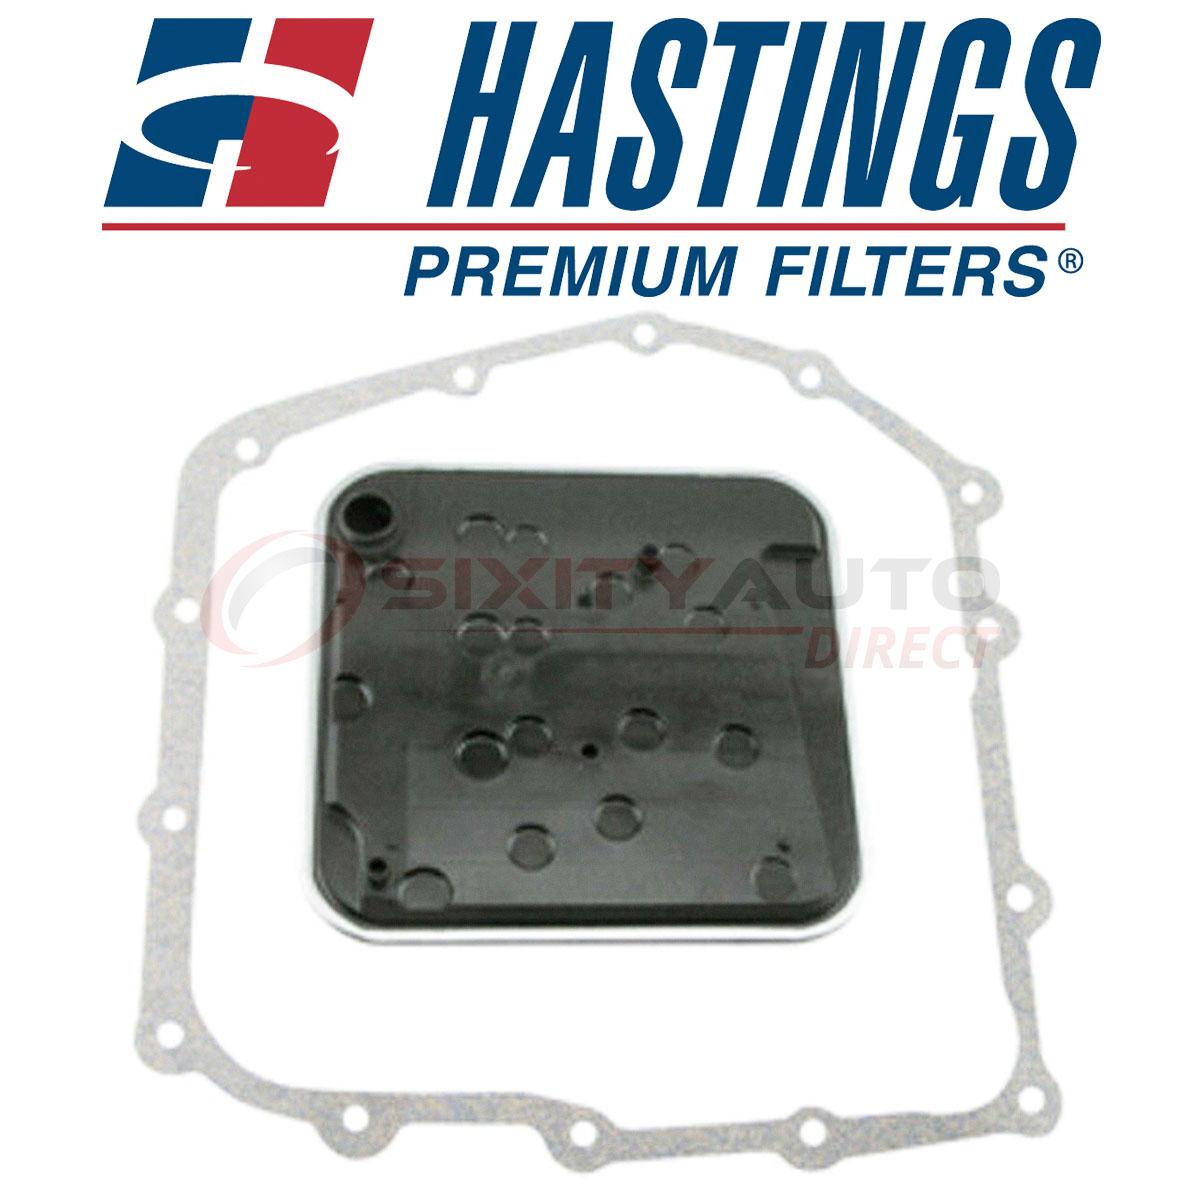 Automatic Transmission Filter Kit For 1989-1993 Chrysler New Yorker 1990 J933KG